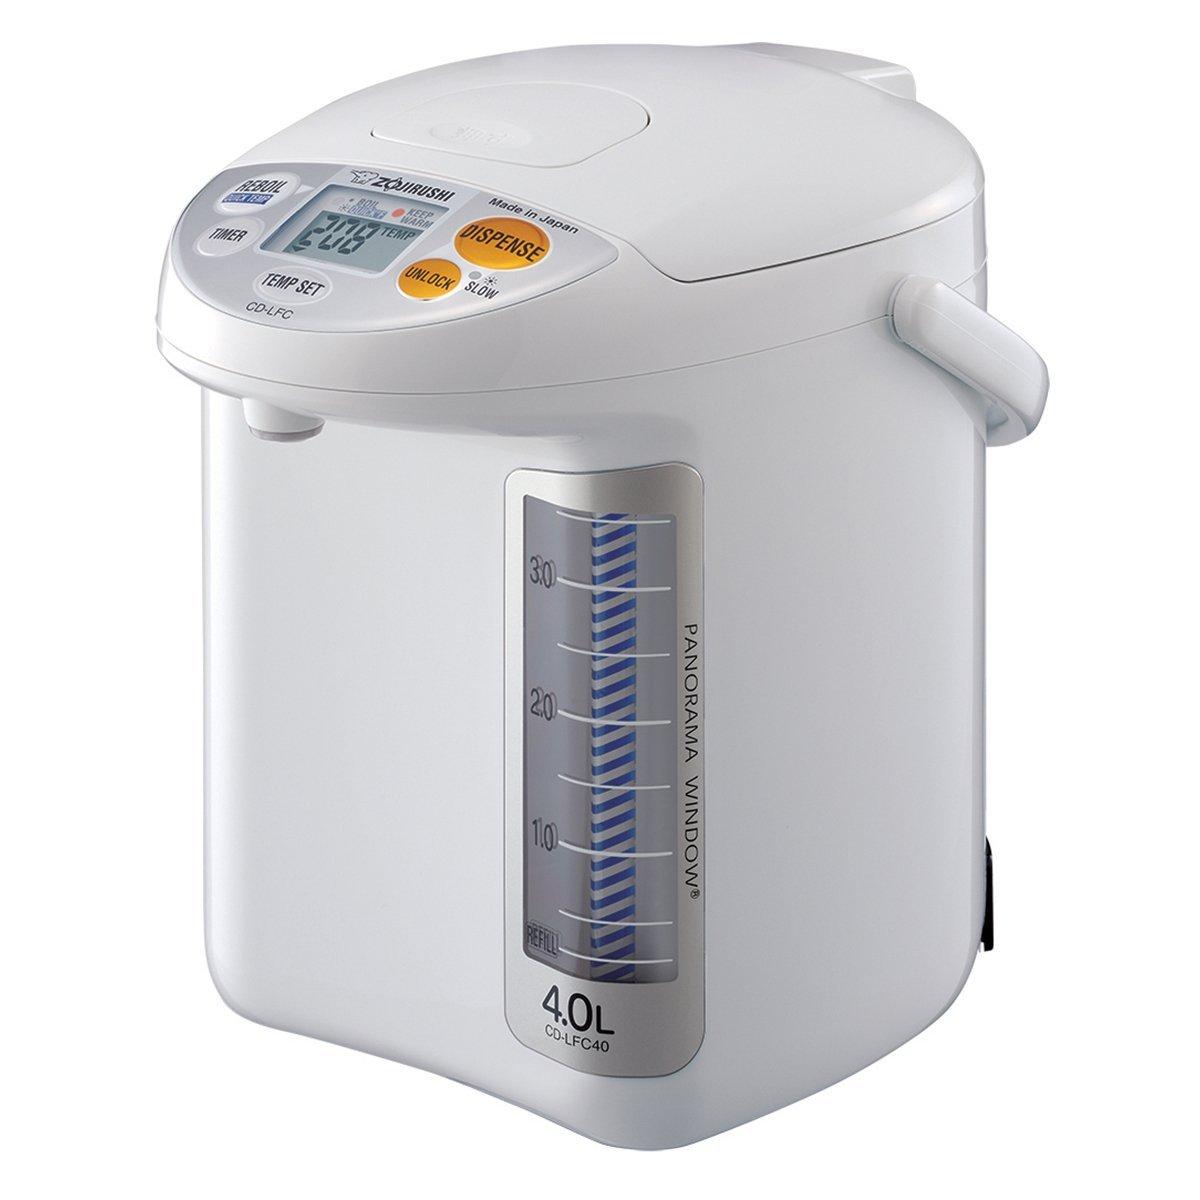 Zojirushi CD-LFC40 Panorama Window Micom Water Boiler and Warmer, 135 oz/4.0 L, White (Renewed) by Zojirushi